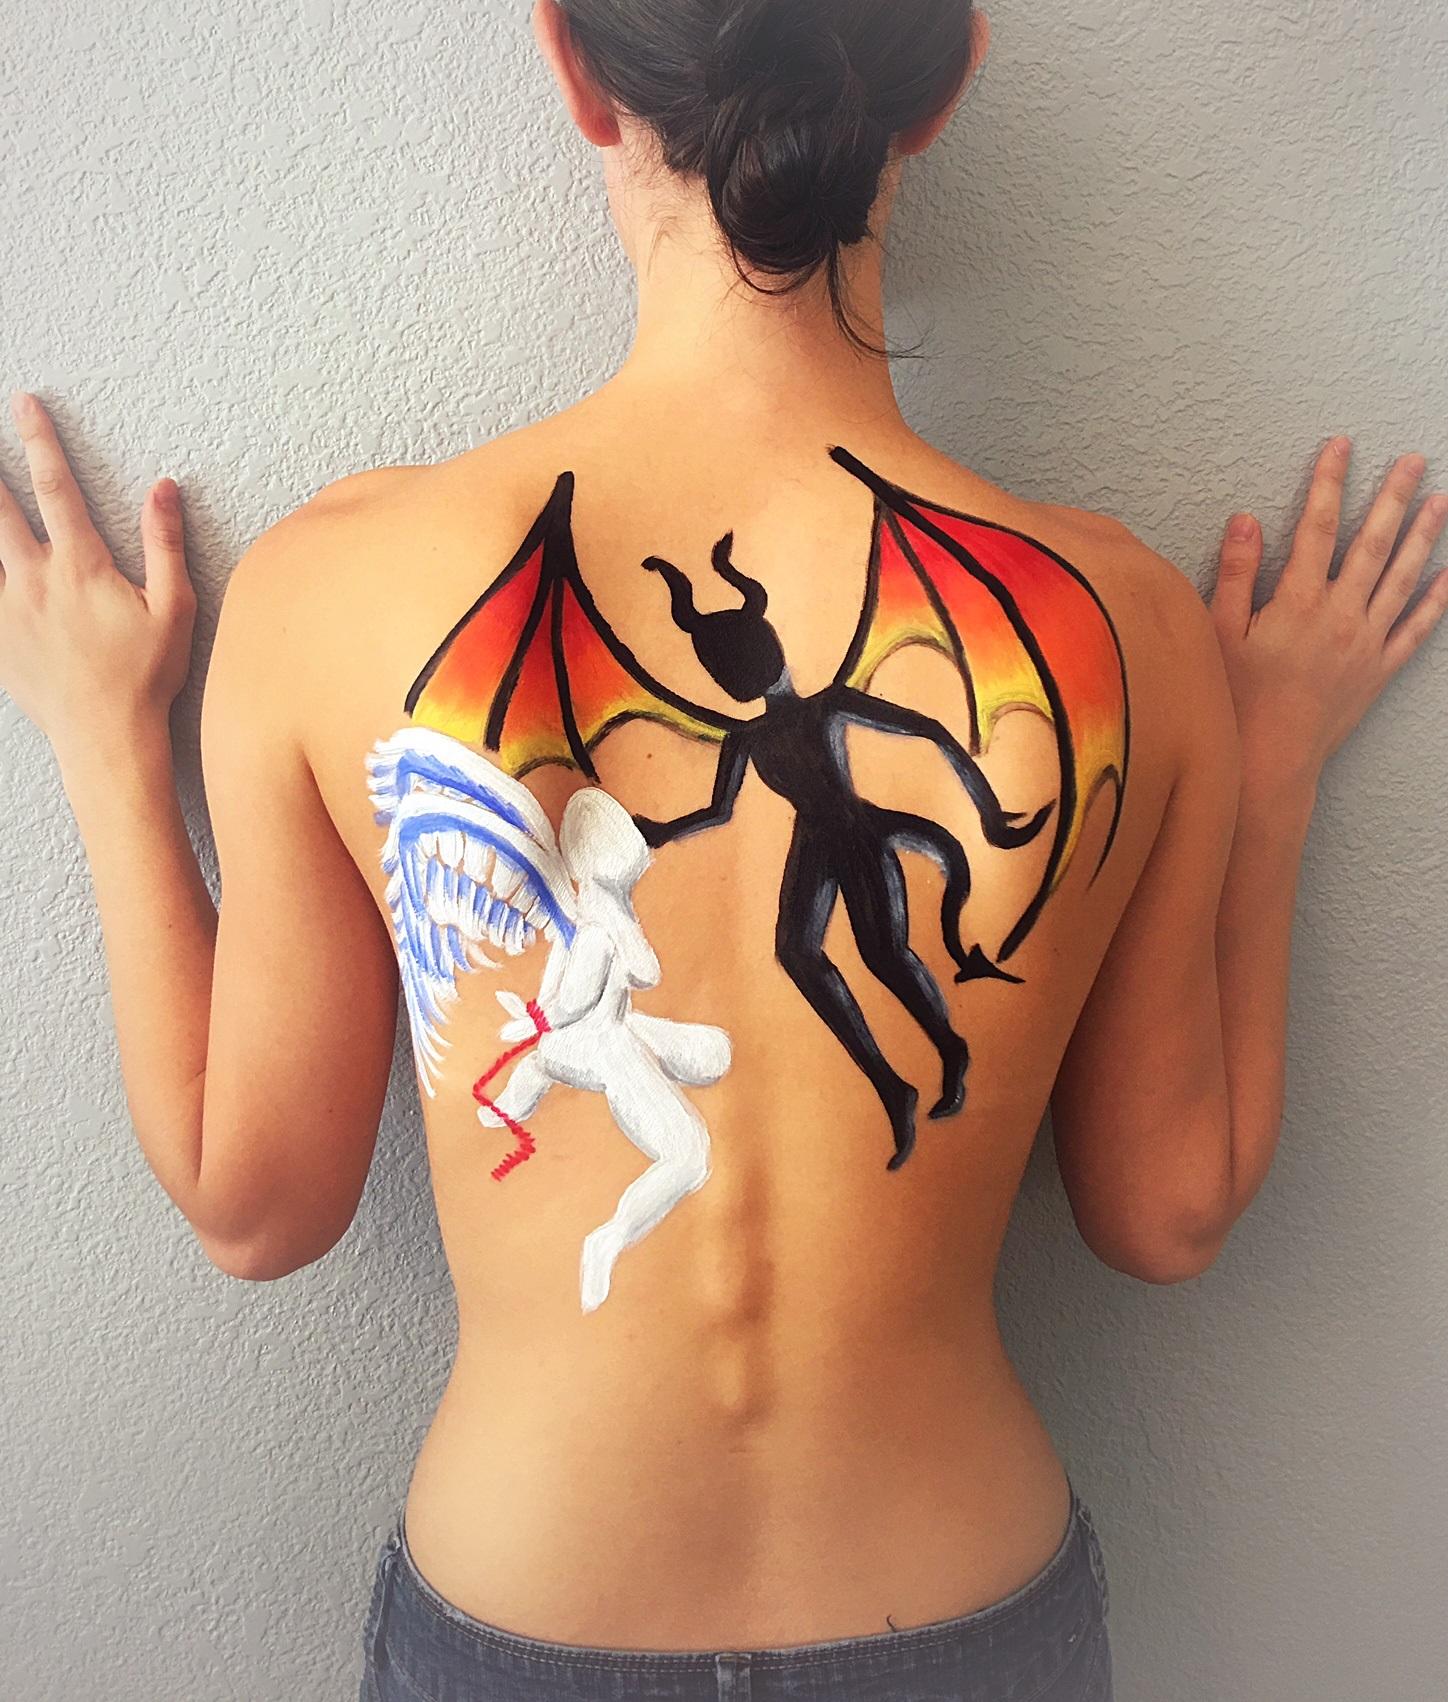 Angel Demon Body Paint.jpg